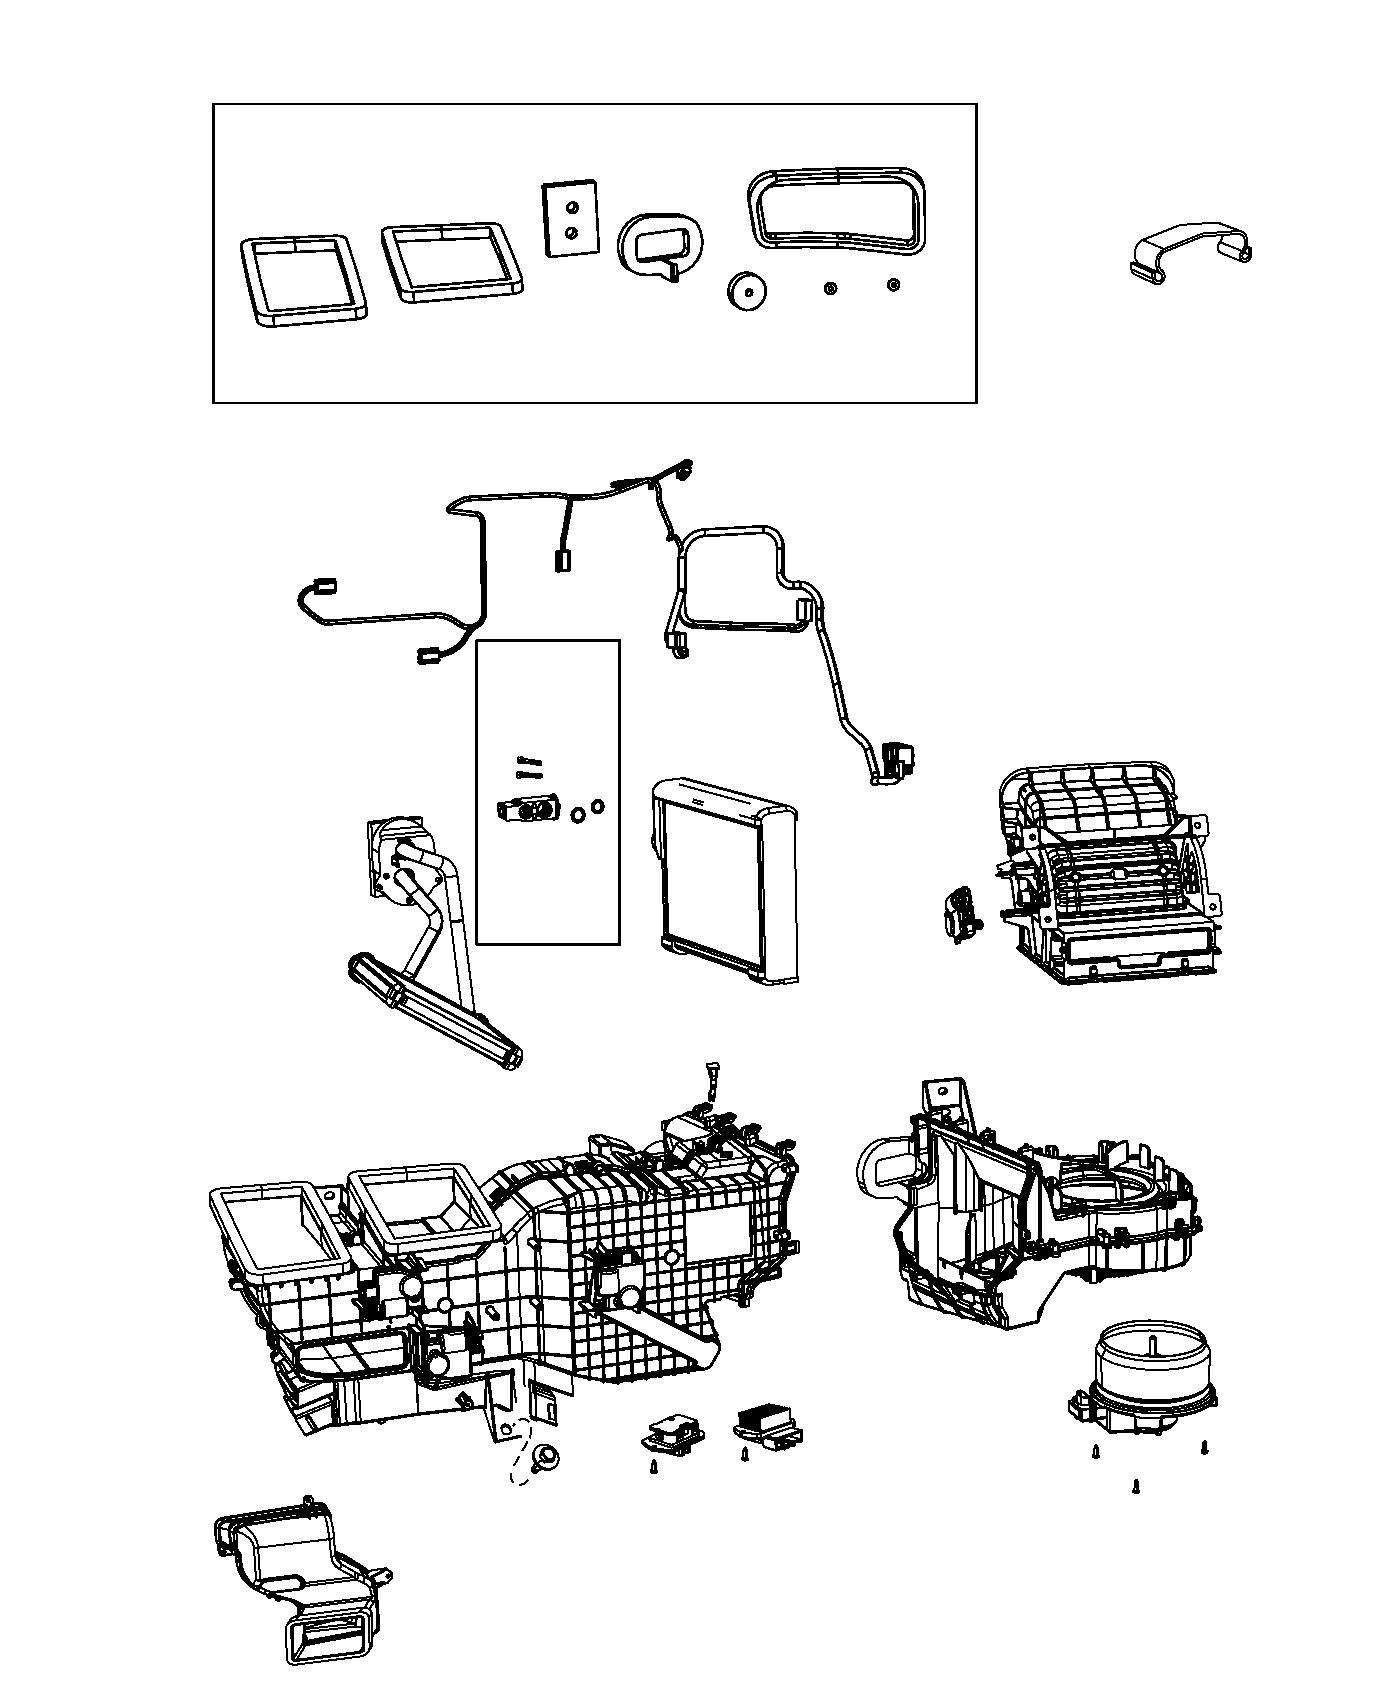 Dodge Ram Housing Distribution Includes Doors Plate Coupler Packing Haa